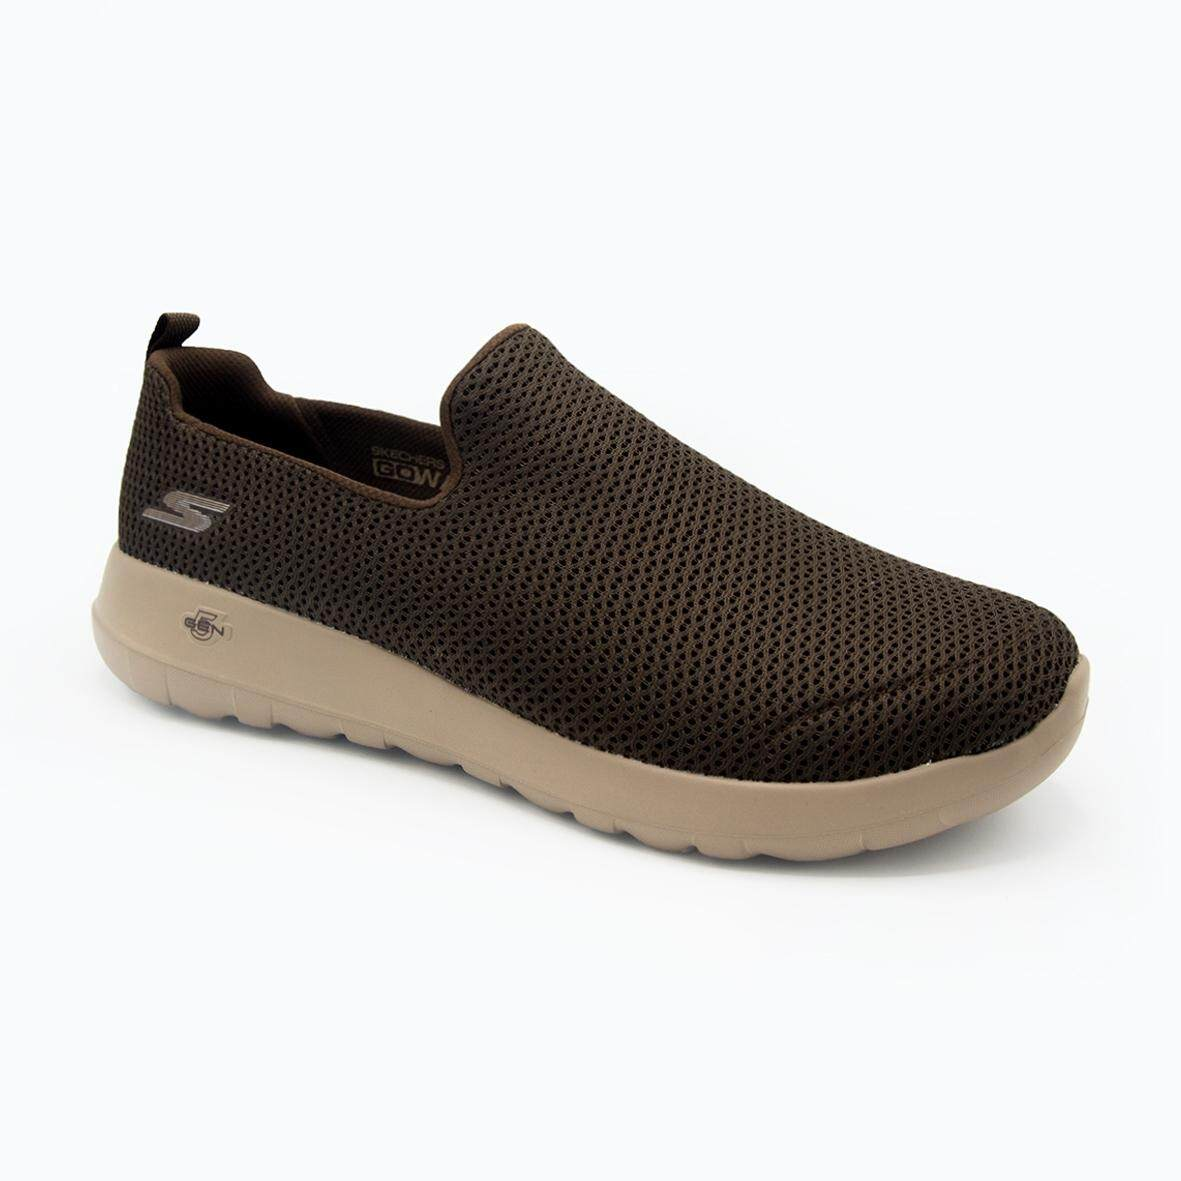 SKECHERS GO WALK MAX 54600/CHOC รองเท้าผู้ชาย